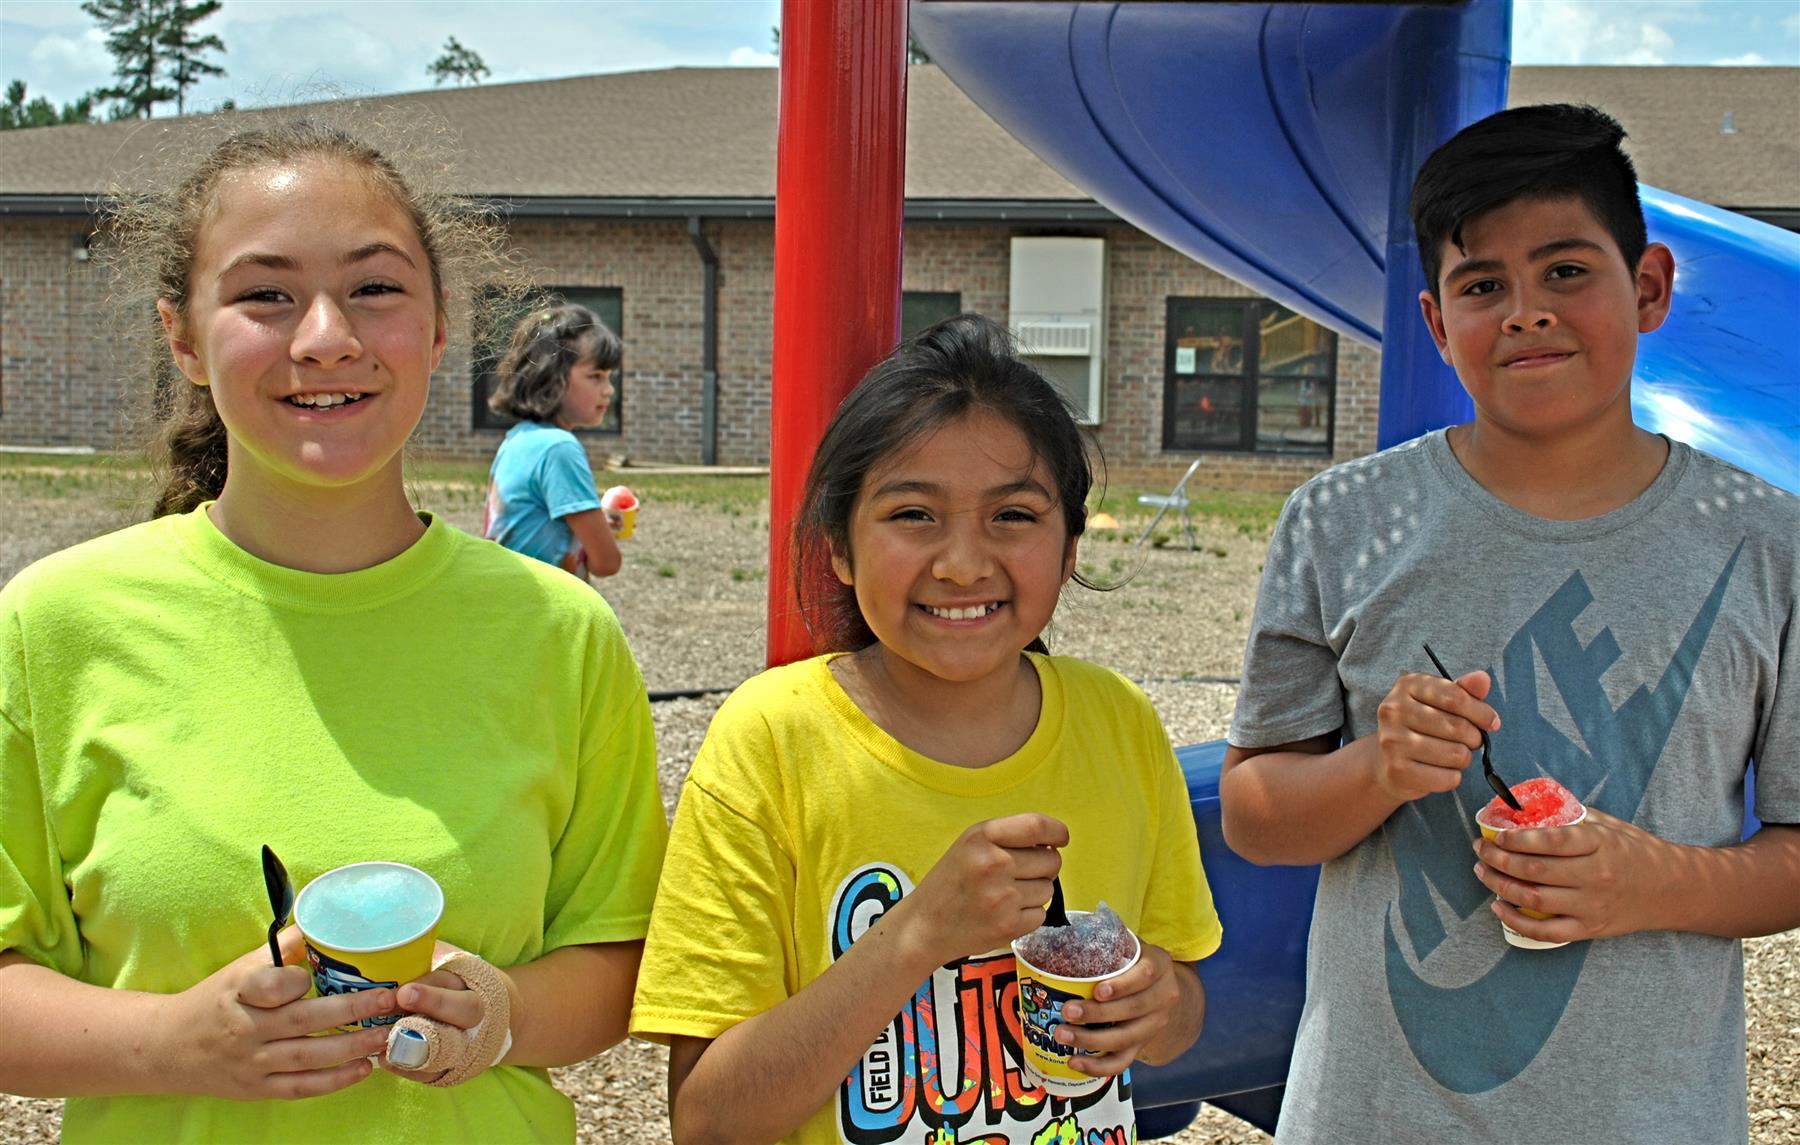 Long Mill Elementary School / Homepage